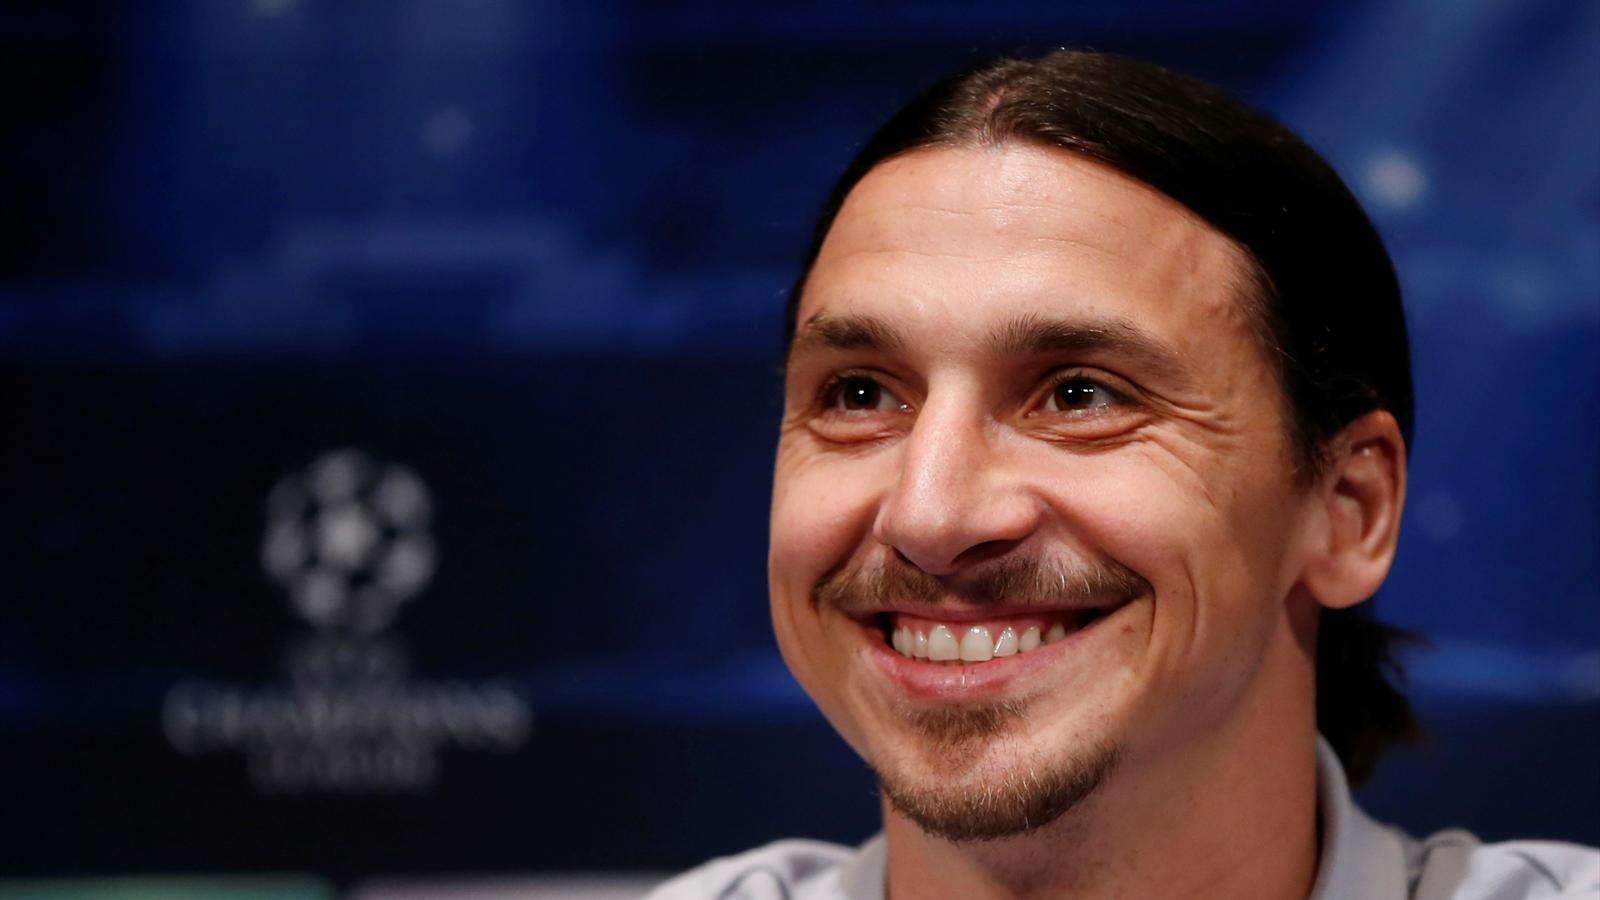 Manchester United announce Zlatan Ibrahimovic signing